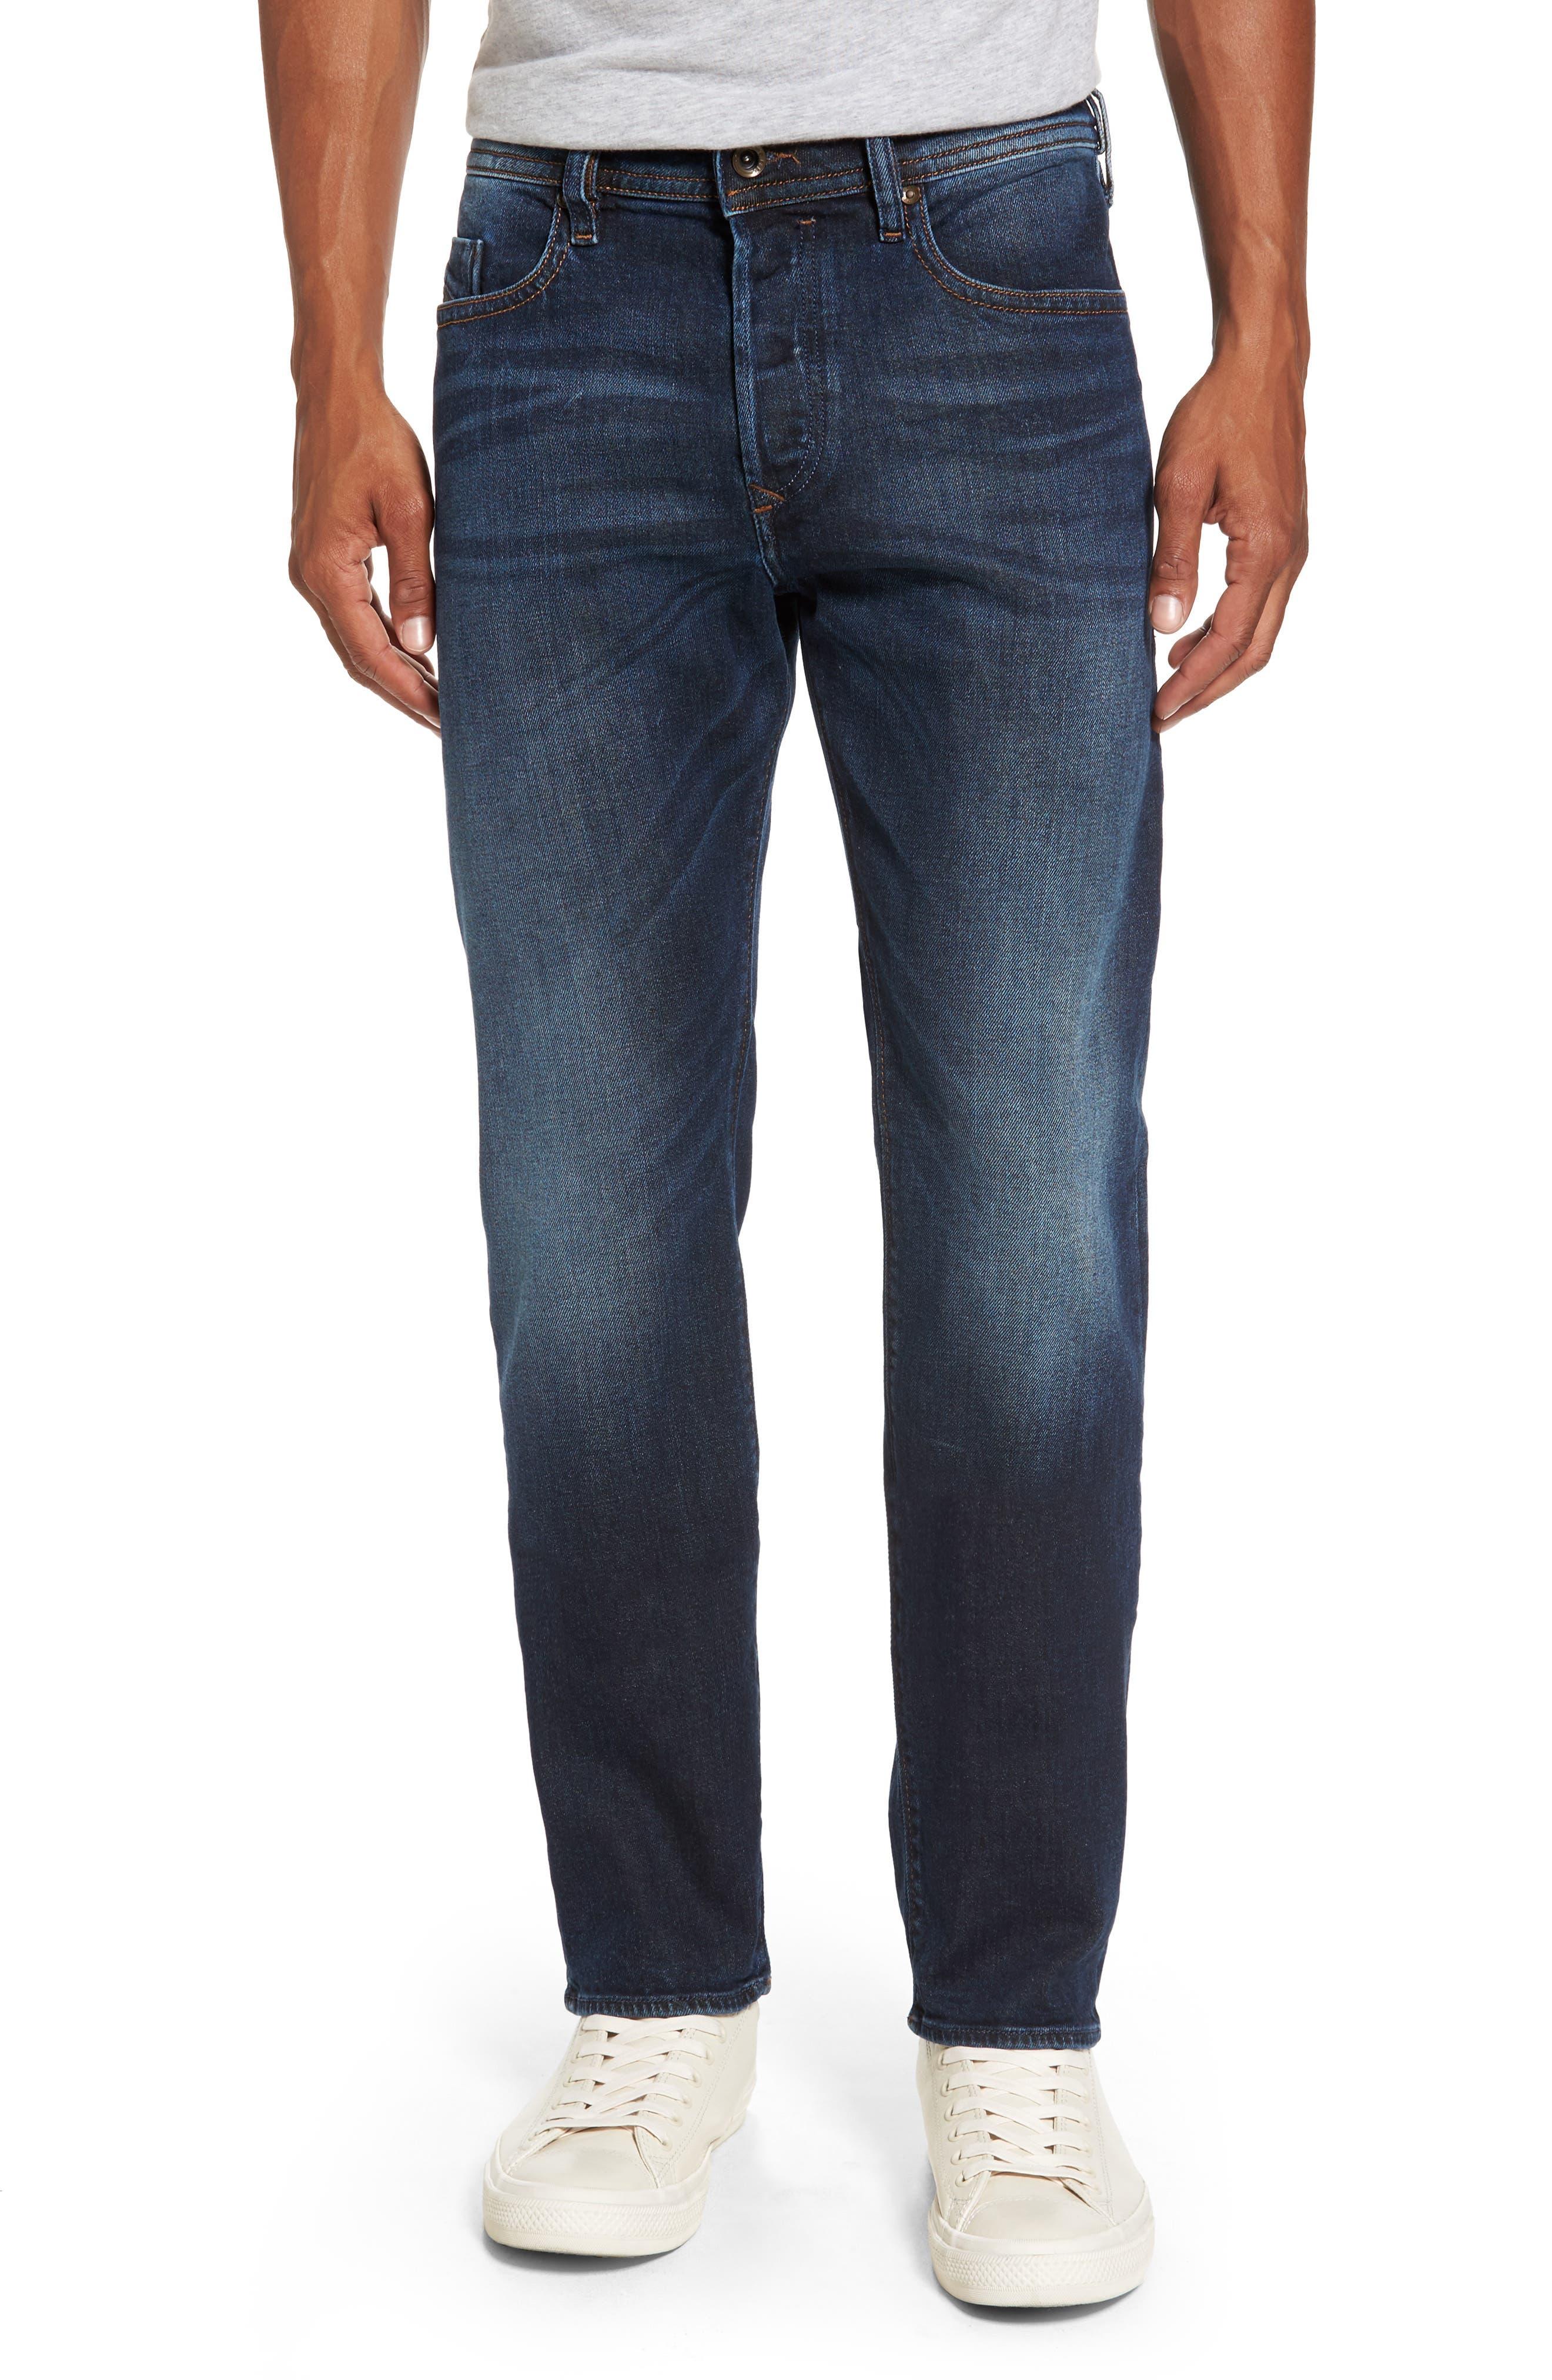 Buster Slim Straight Leg Jeans,                             Main thumbnail 1, color,                             Denim